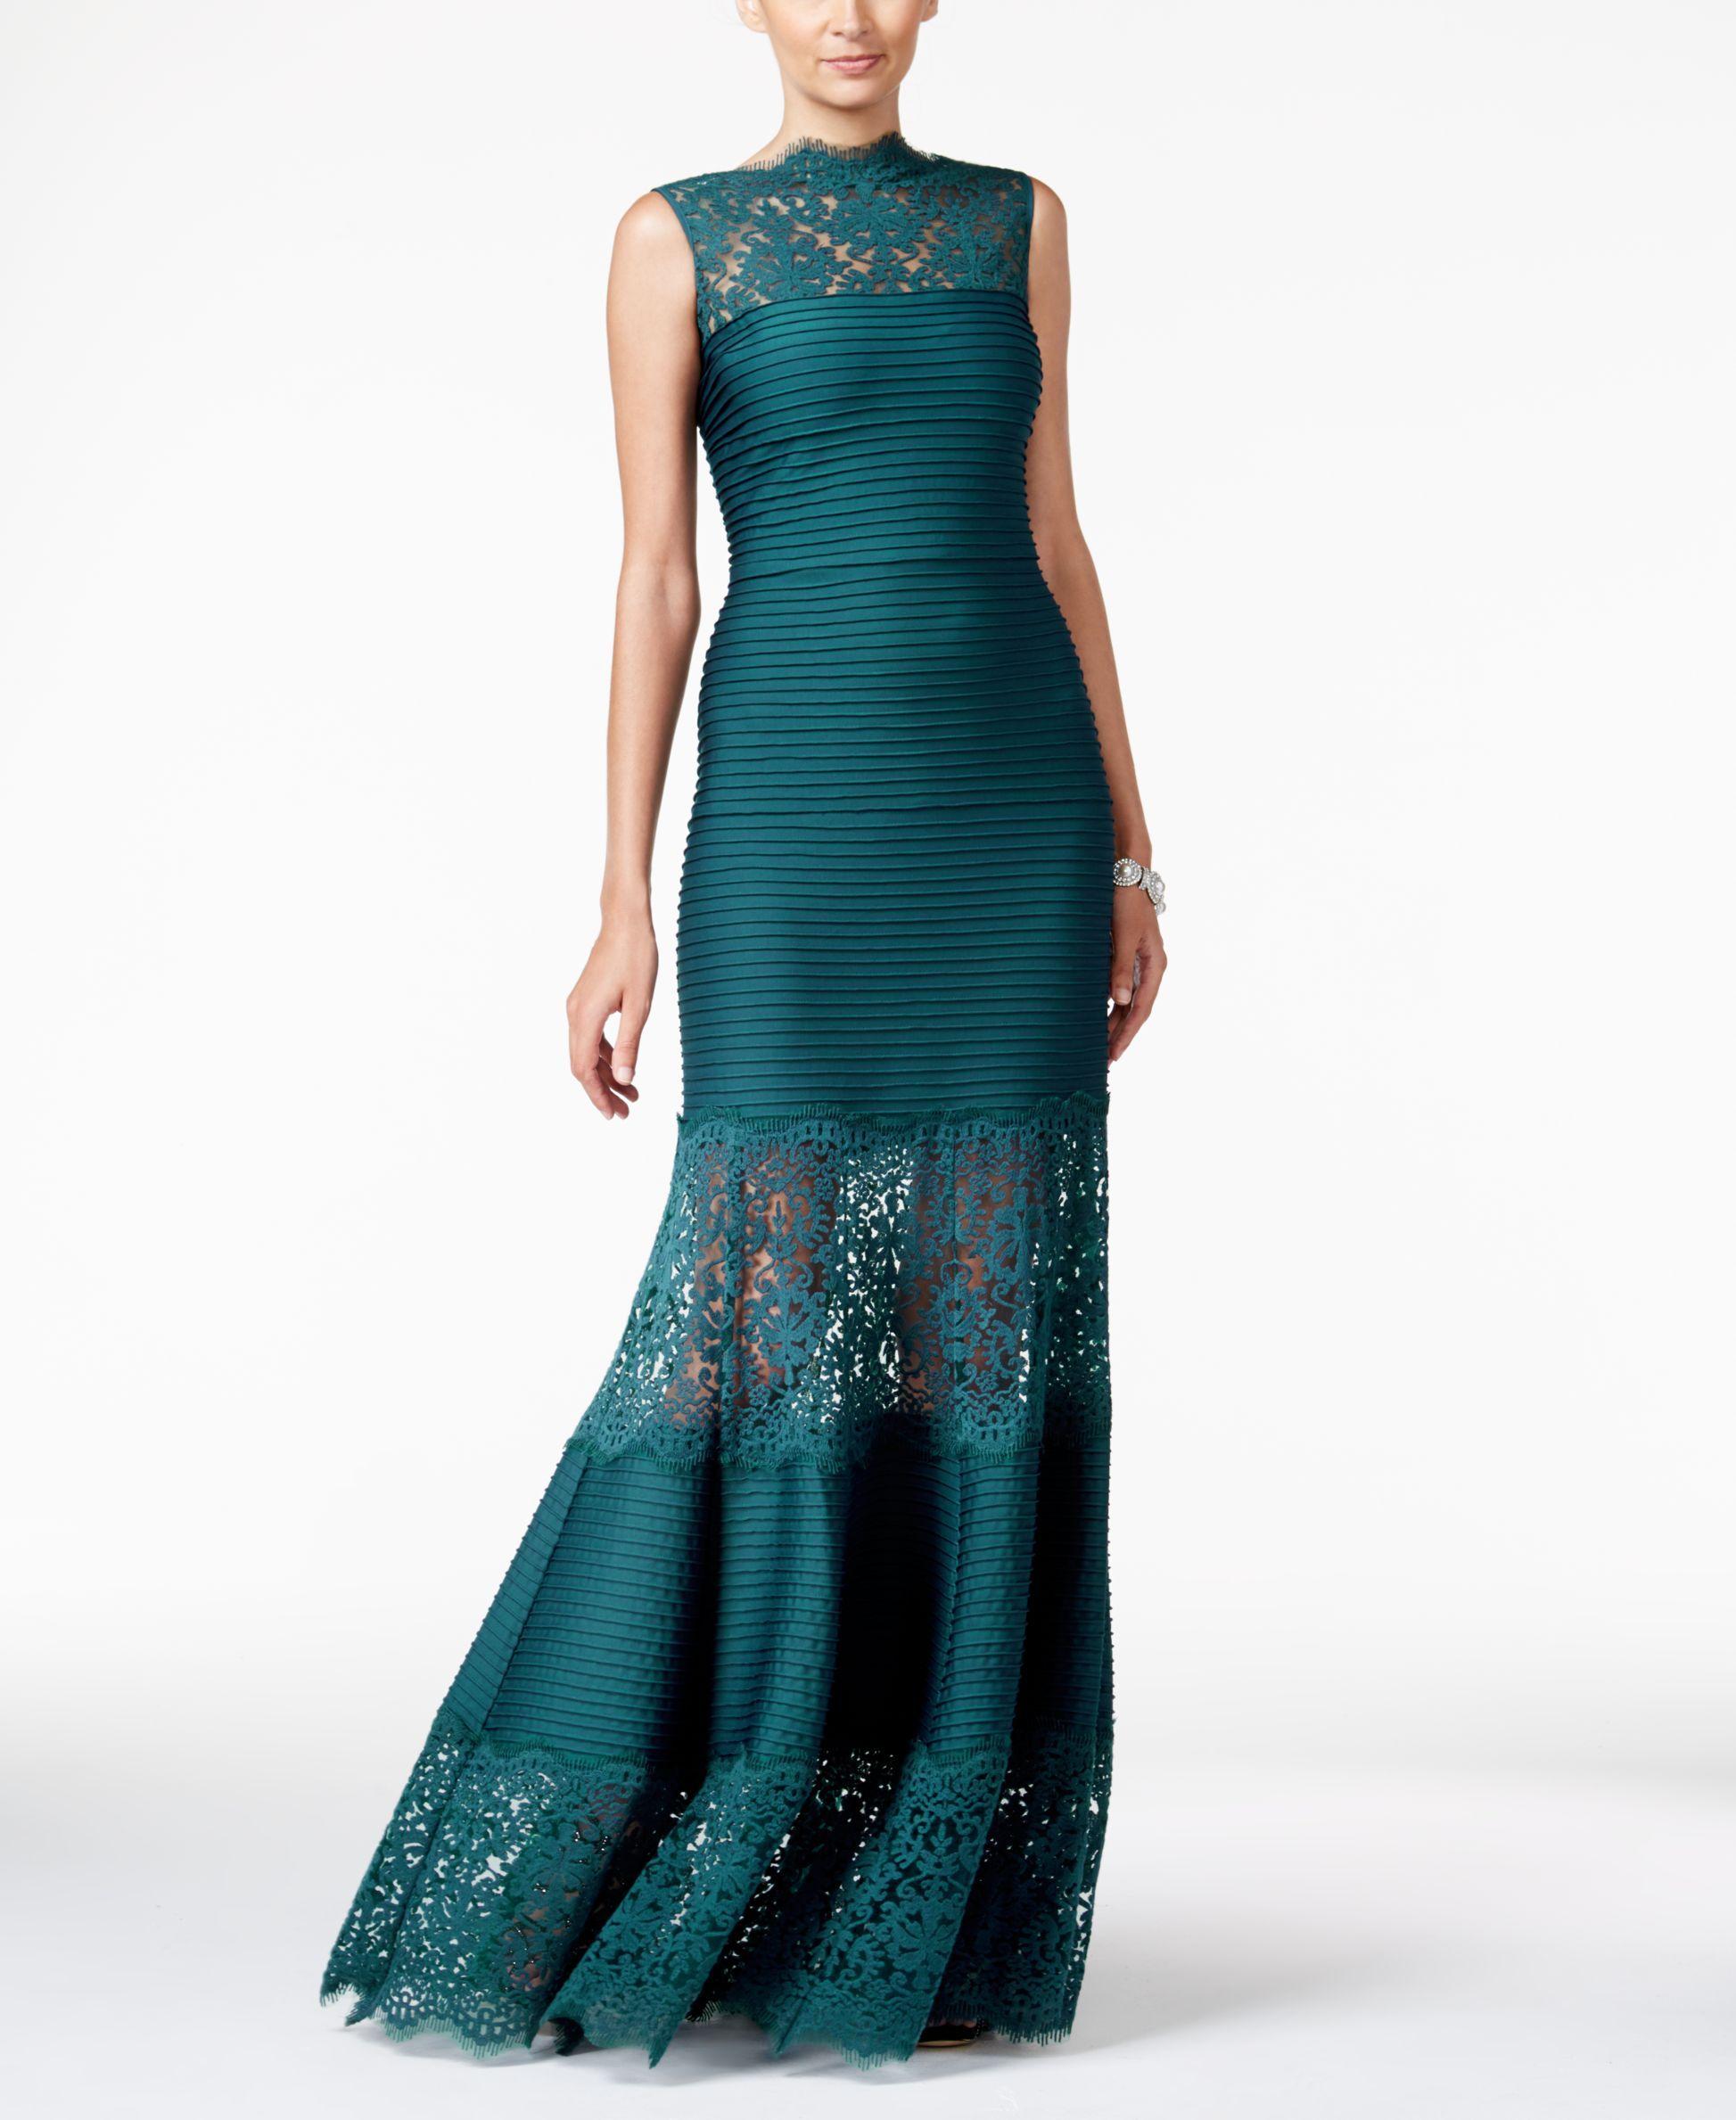 Tadashi Shoji Lace-Inset Evening Gown | Tadashi shoji, Lace inset ...